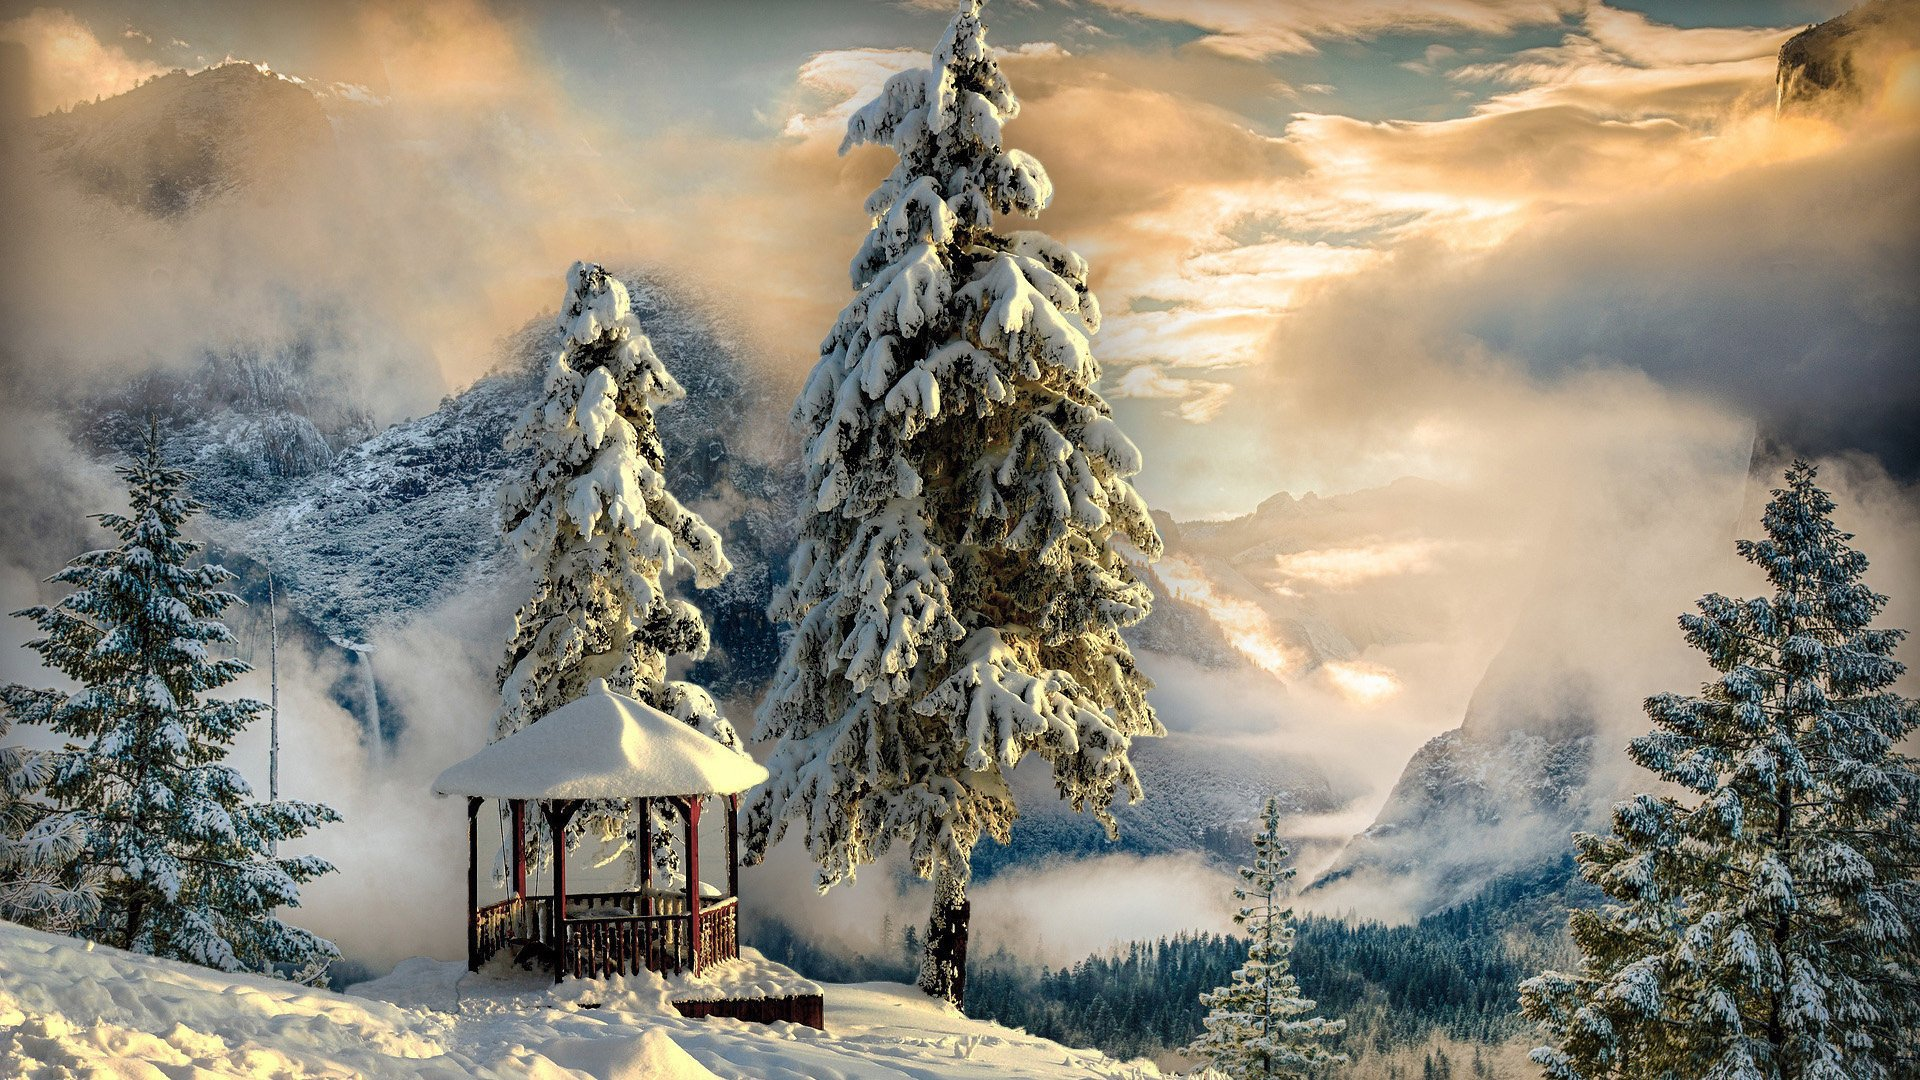 горы зима обои, туман, лес, беседка, hd